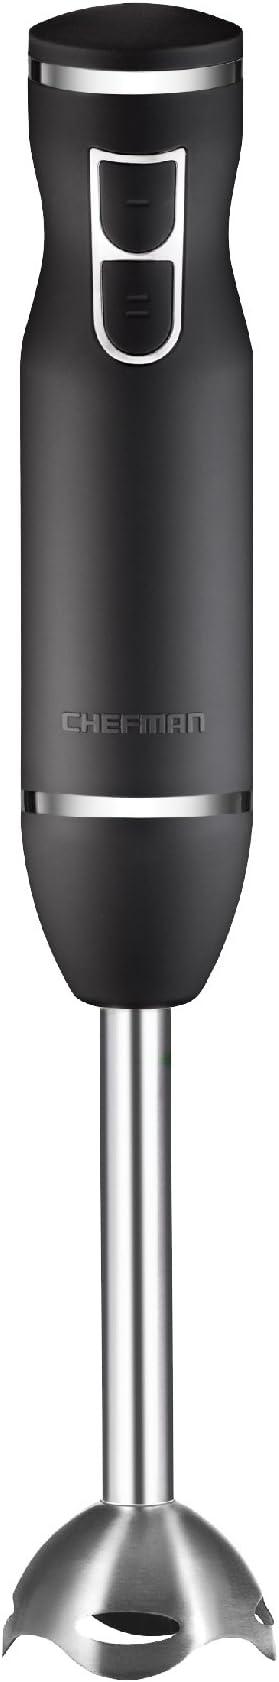 Chefman Immersion Stick Hand Blender Includes Stainless Steel Shaft & Blades